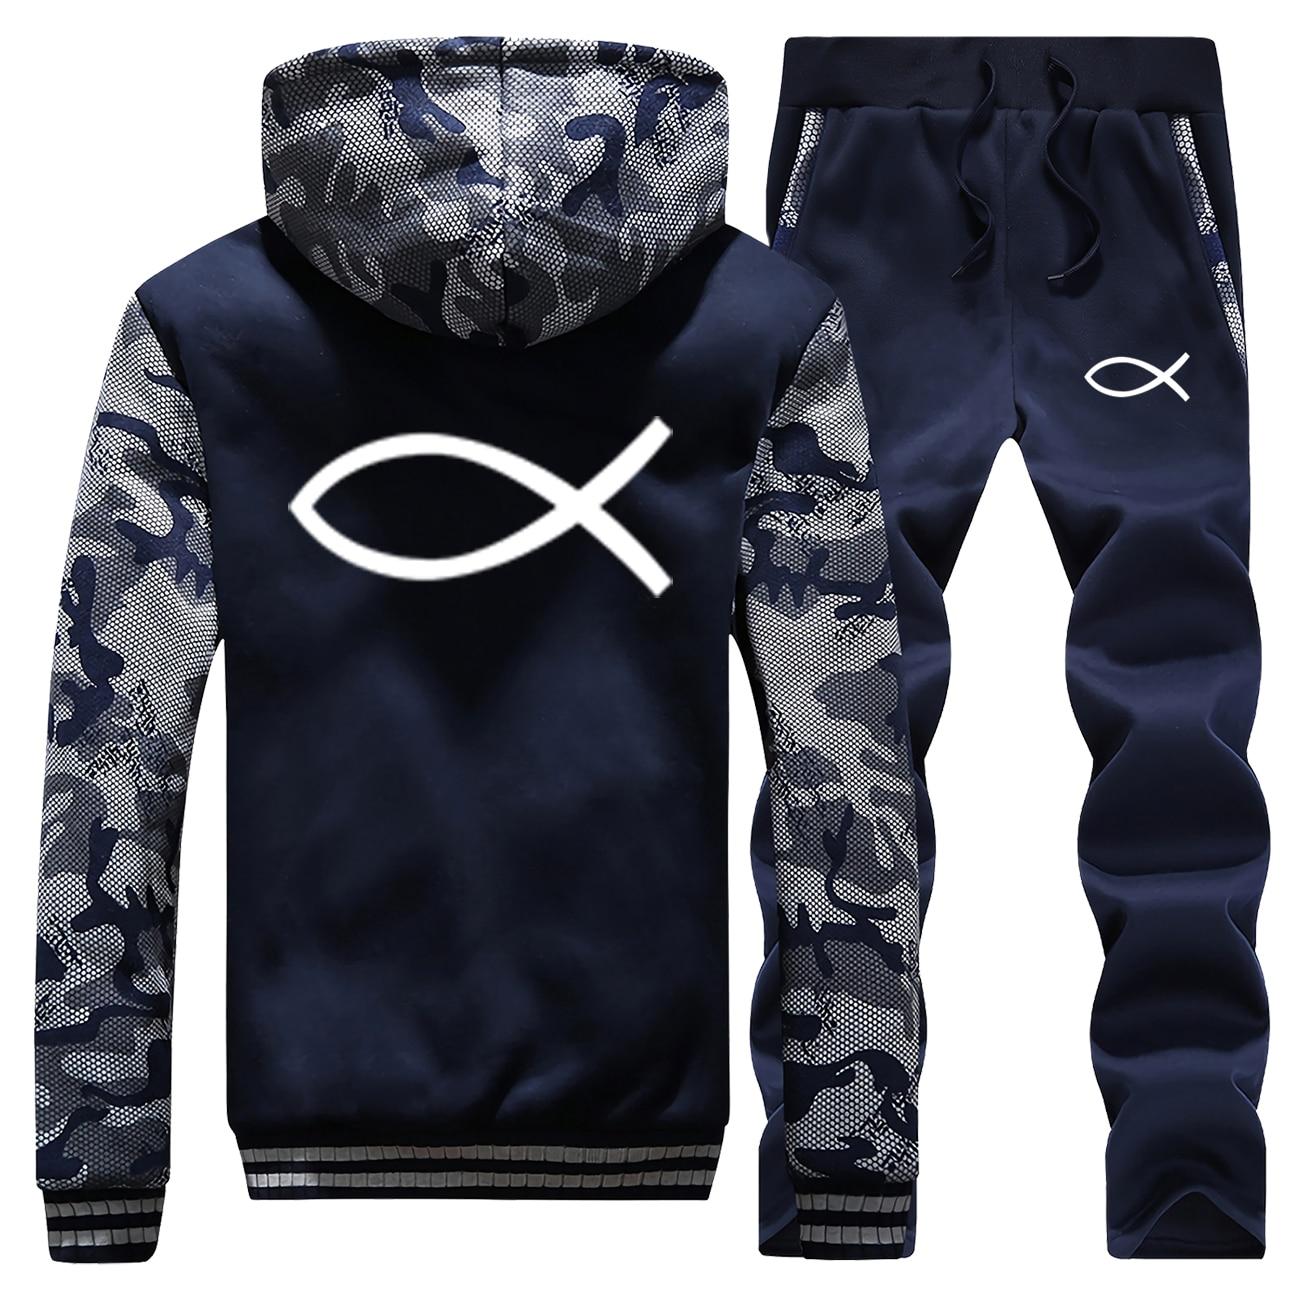 2019 Winter Hot Sale Jesus Fish Simple Printed Sweatshirt Men Camouflage Jackets Suit Coat Thick Sportswear+Pants 2 Piece Set